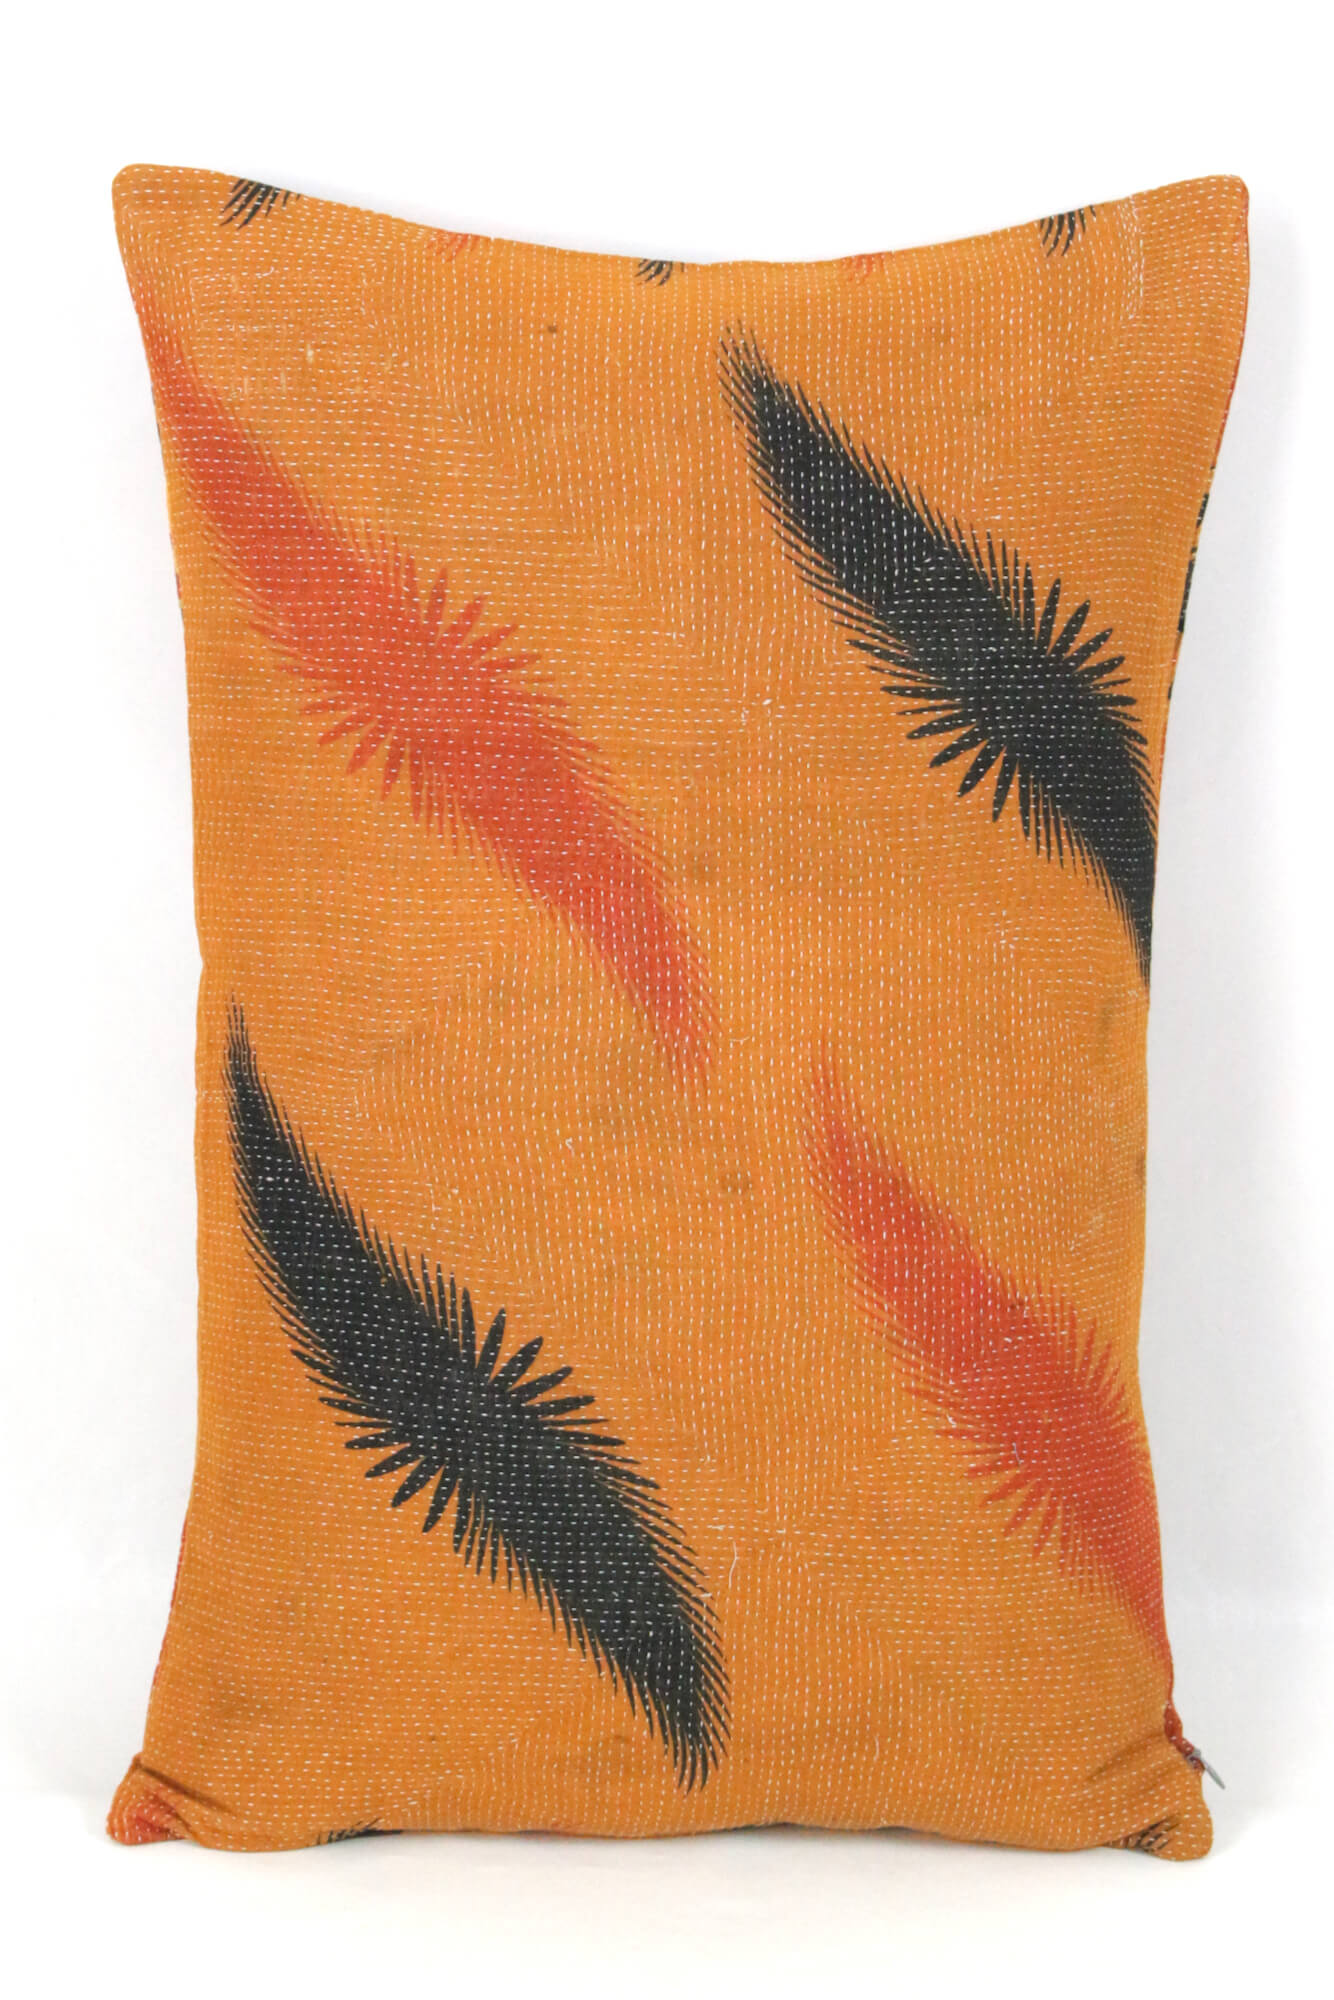 Buntes Kissen Baumwolle, Indien, 40x60